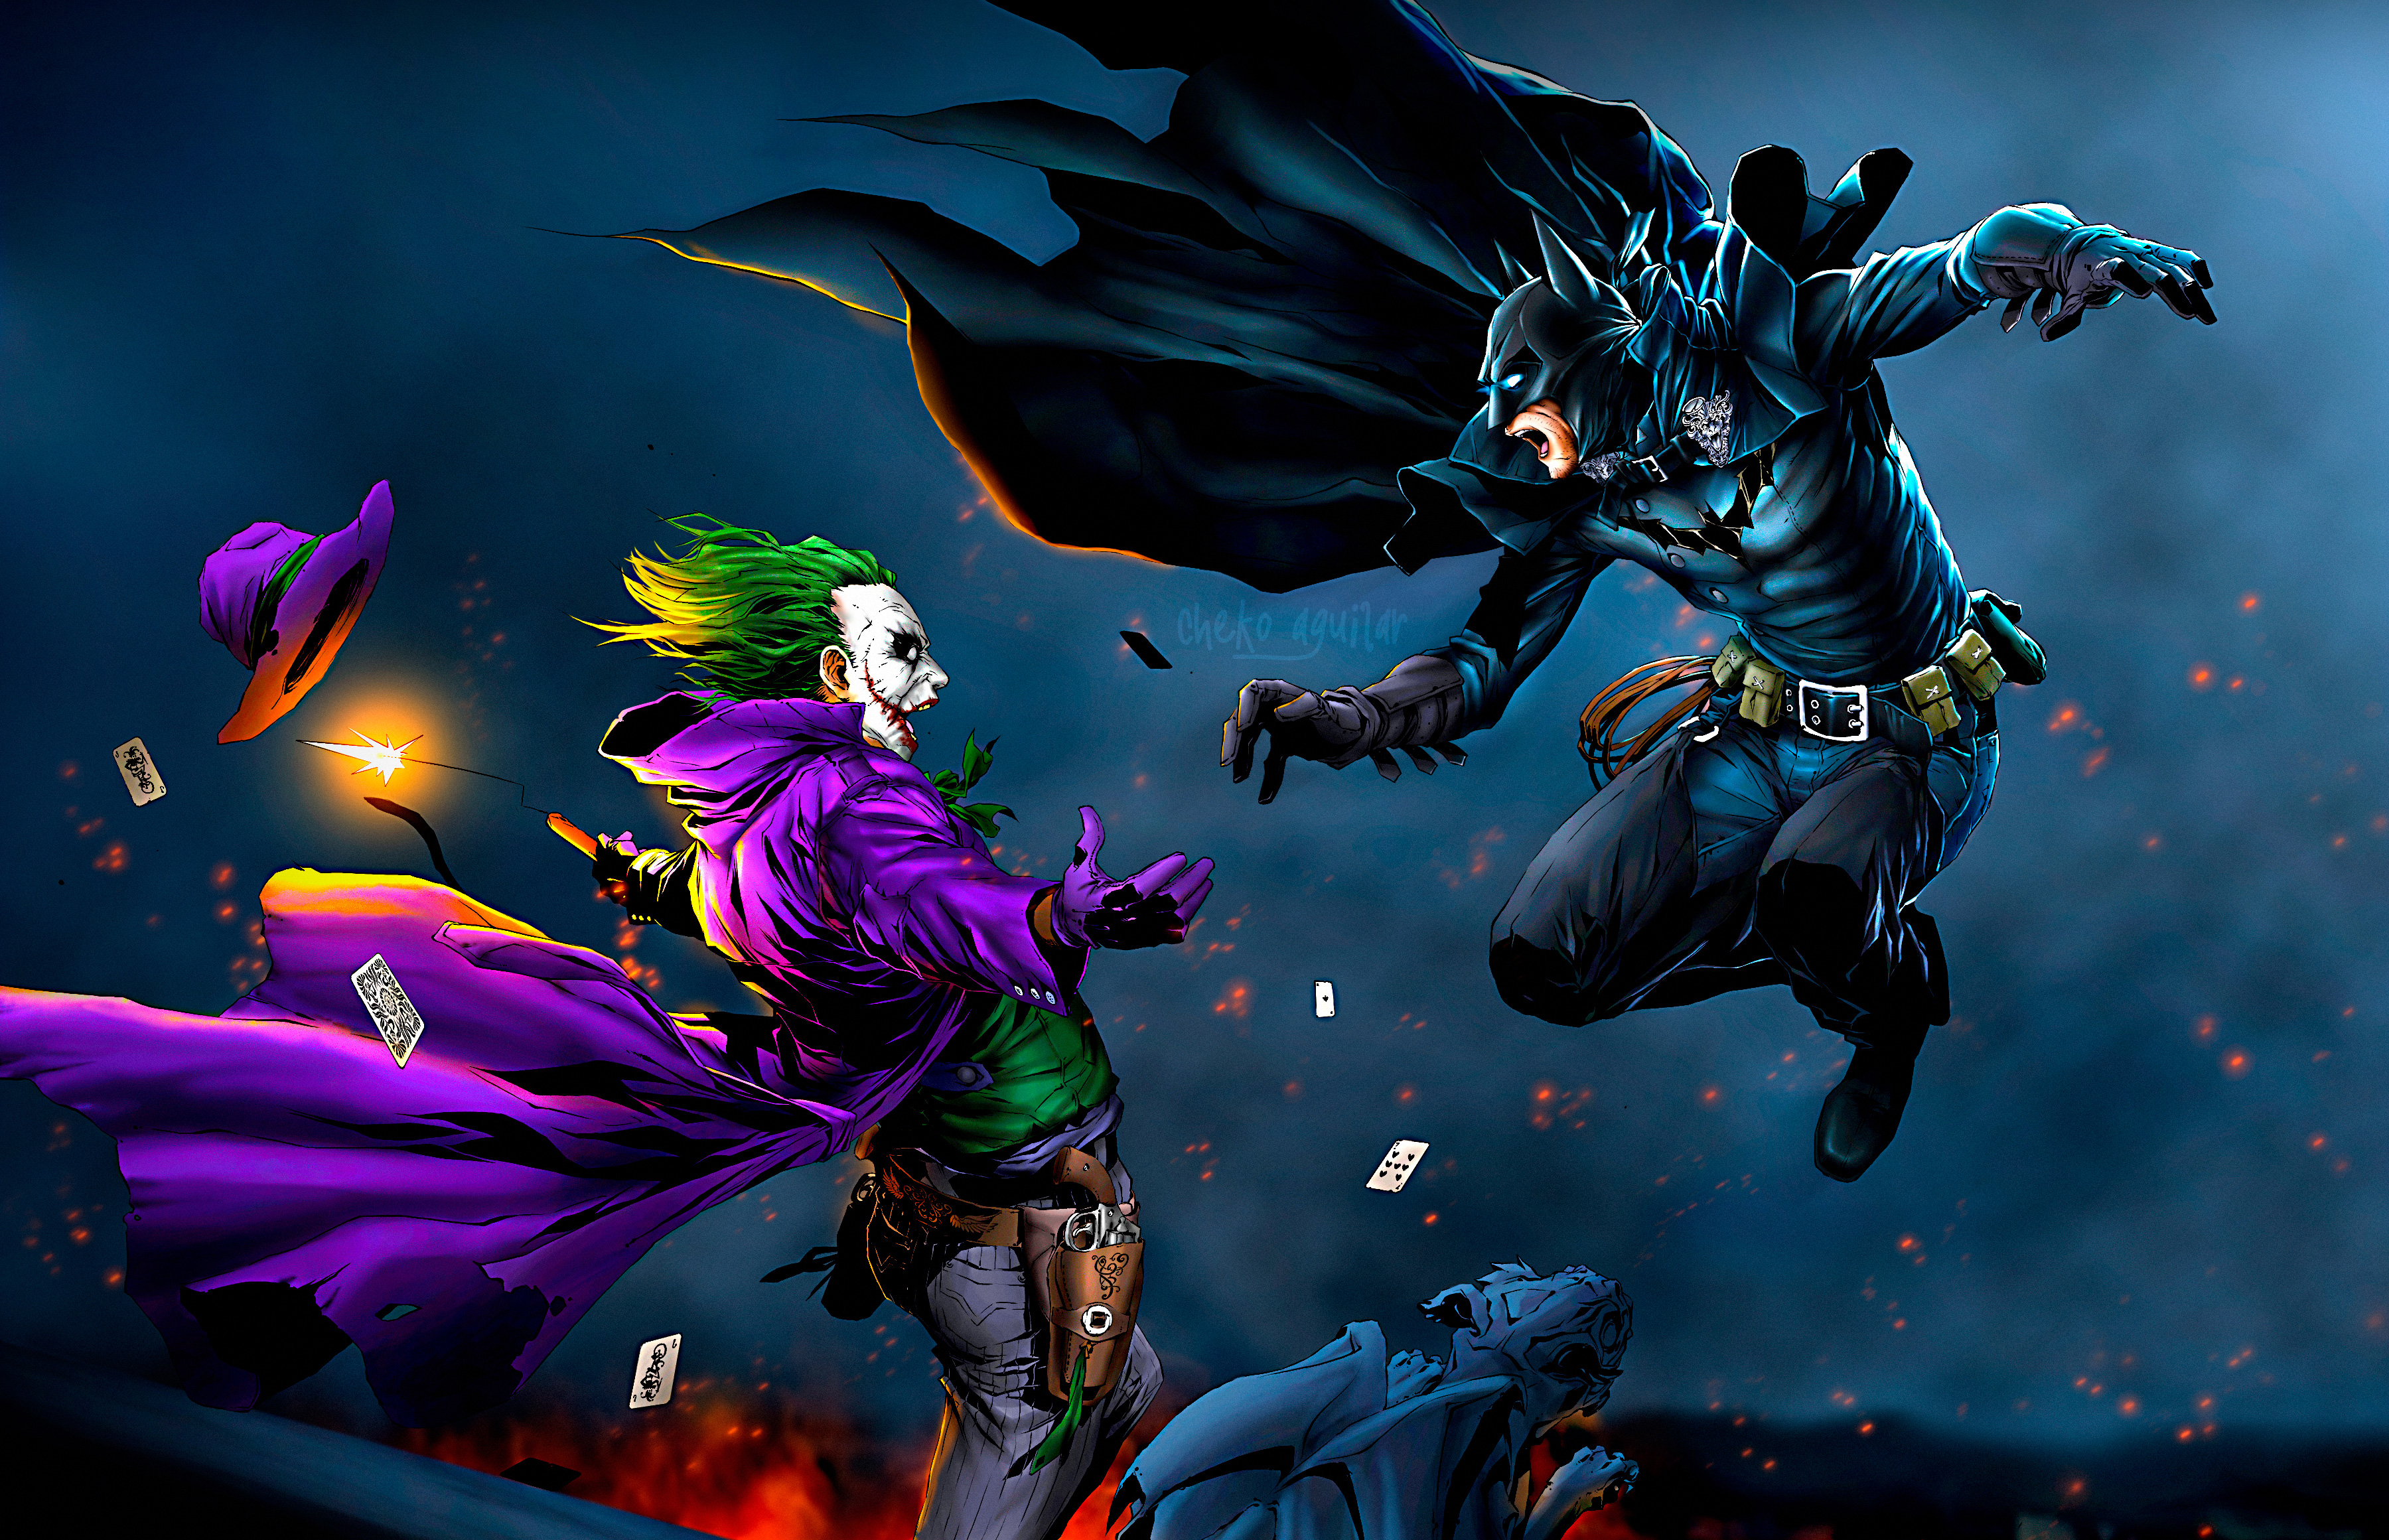 Deviantart: Batman Vs Joker, HD Superheroes, 4k Wallpapers, Images